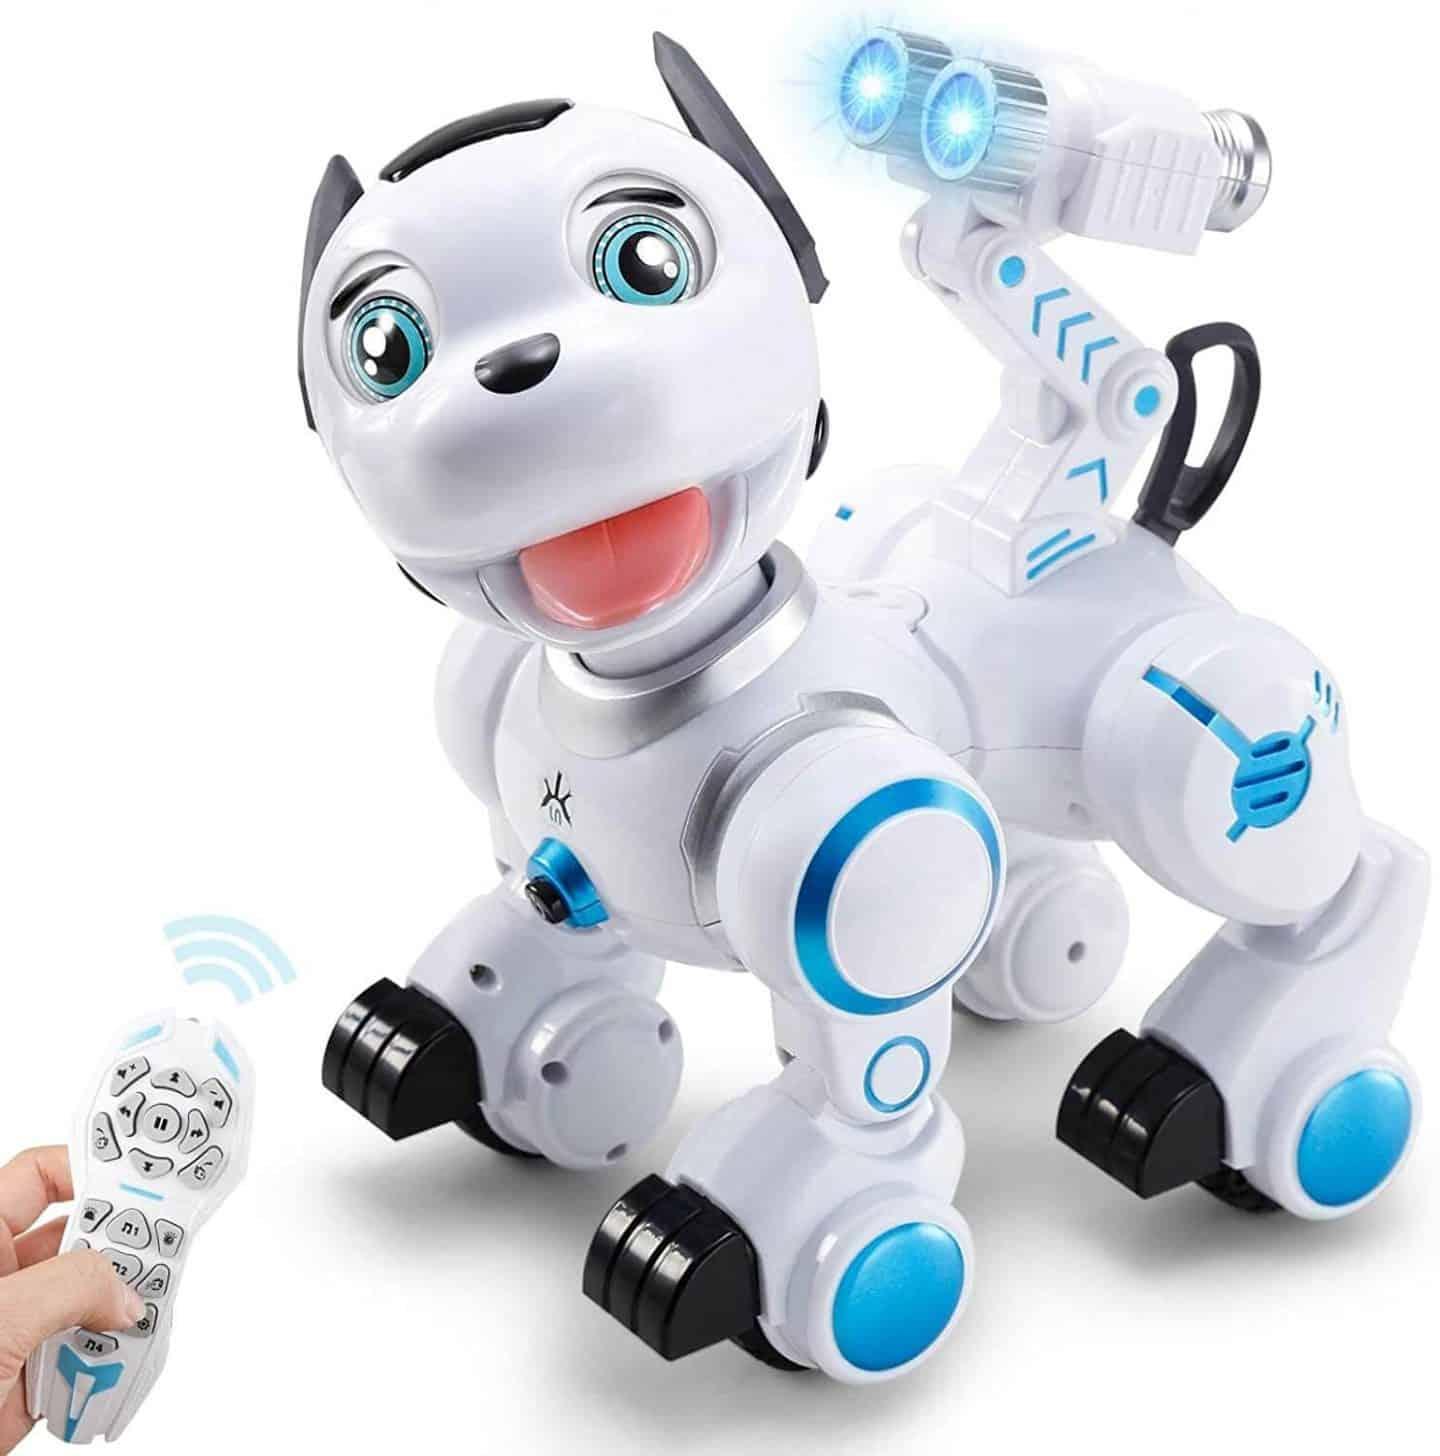 RC Robot Dog Toy - Smart Pet Dog Wink Bark Touch Sense Programmable Robot Toy